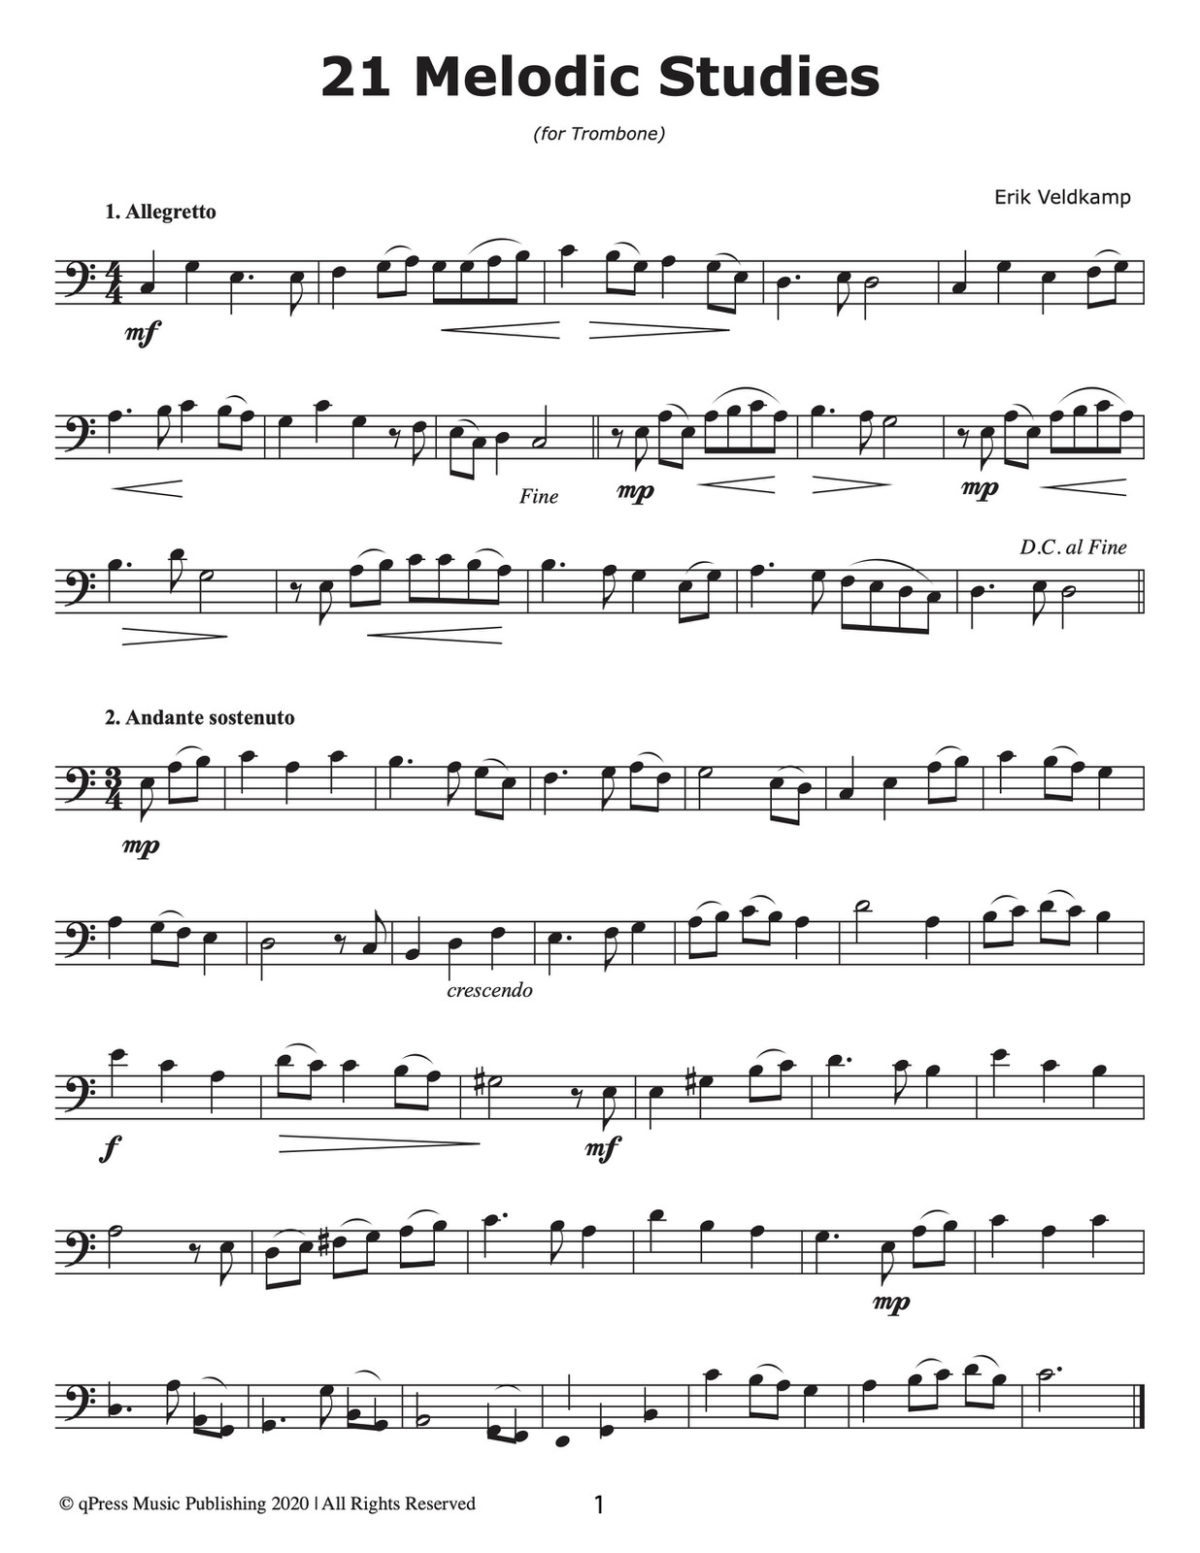 21 melodic Studies for Trombone